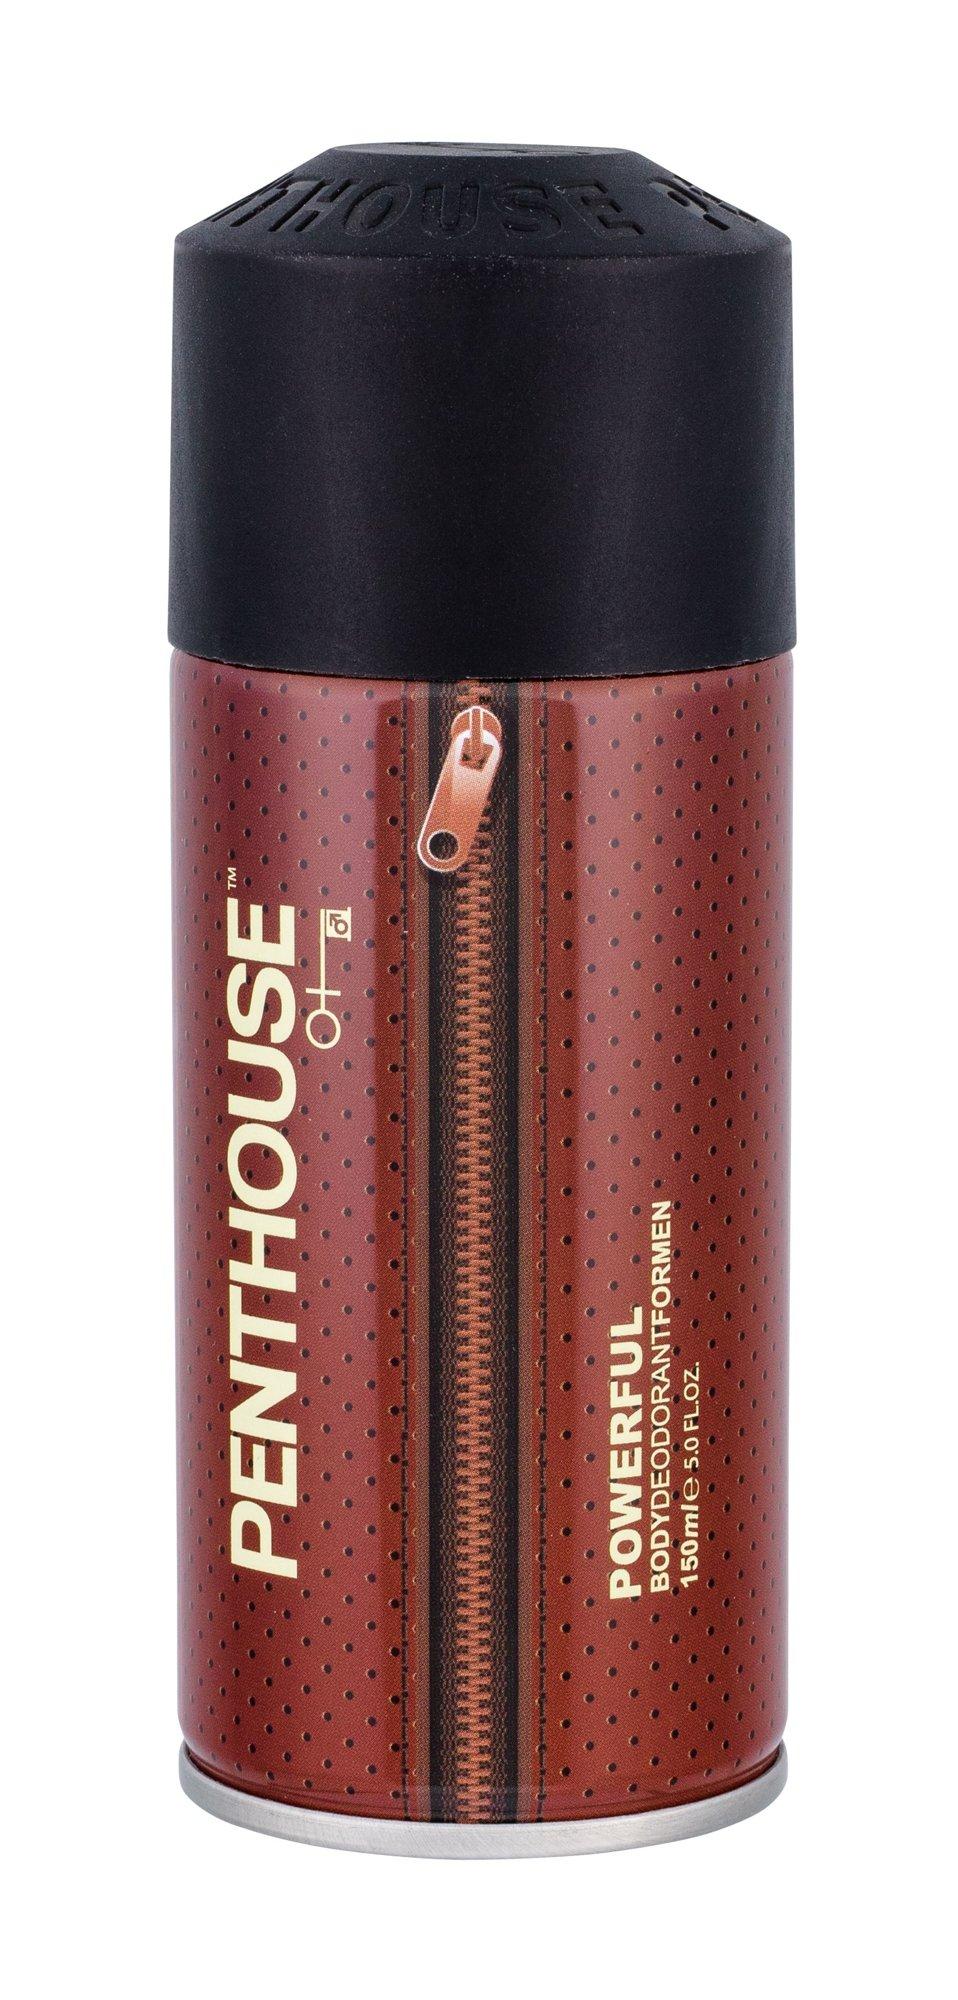 Penthouse Powerful Deodorant 150ml